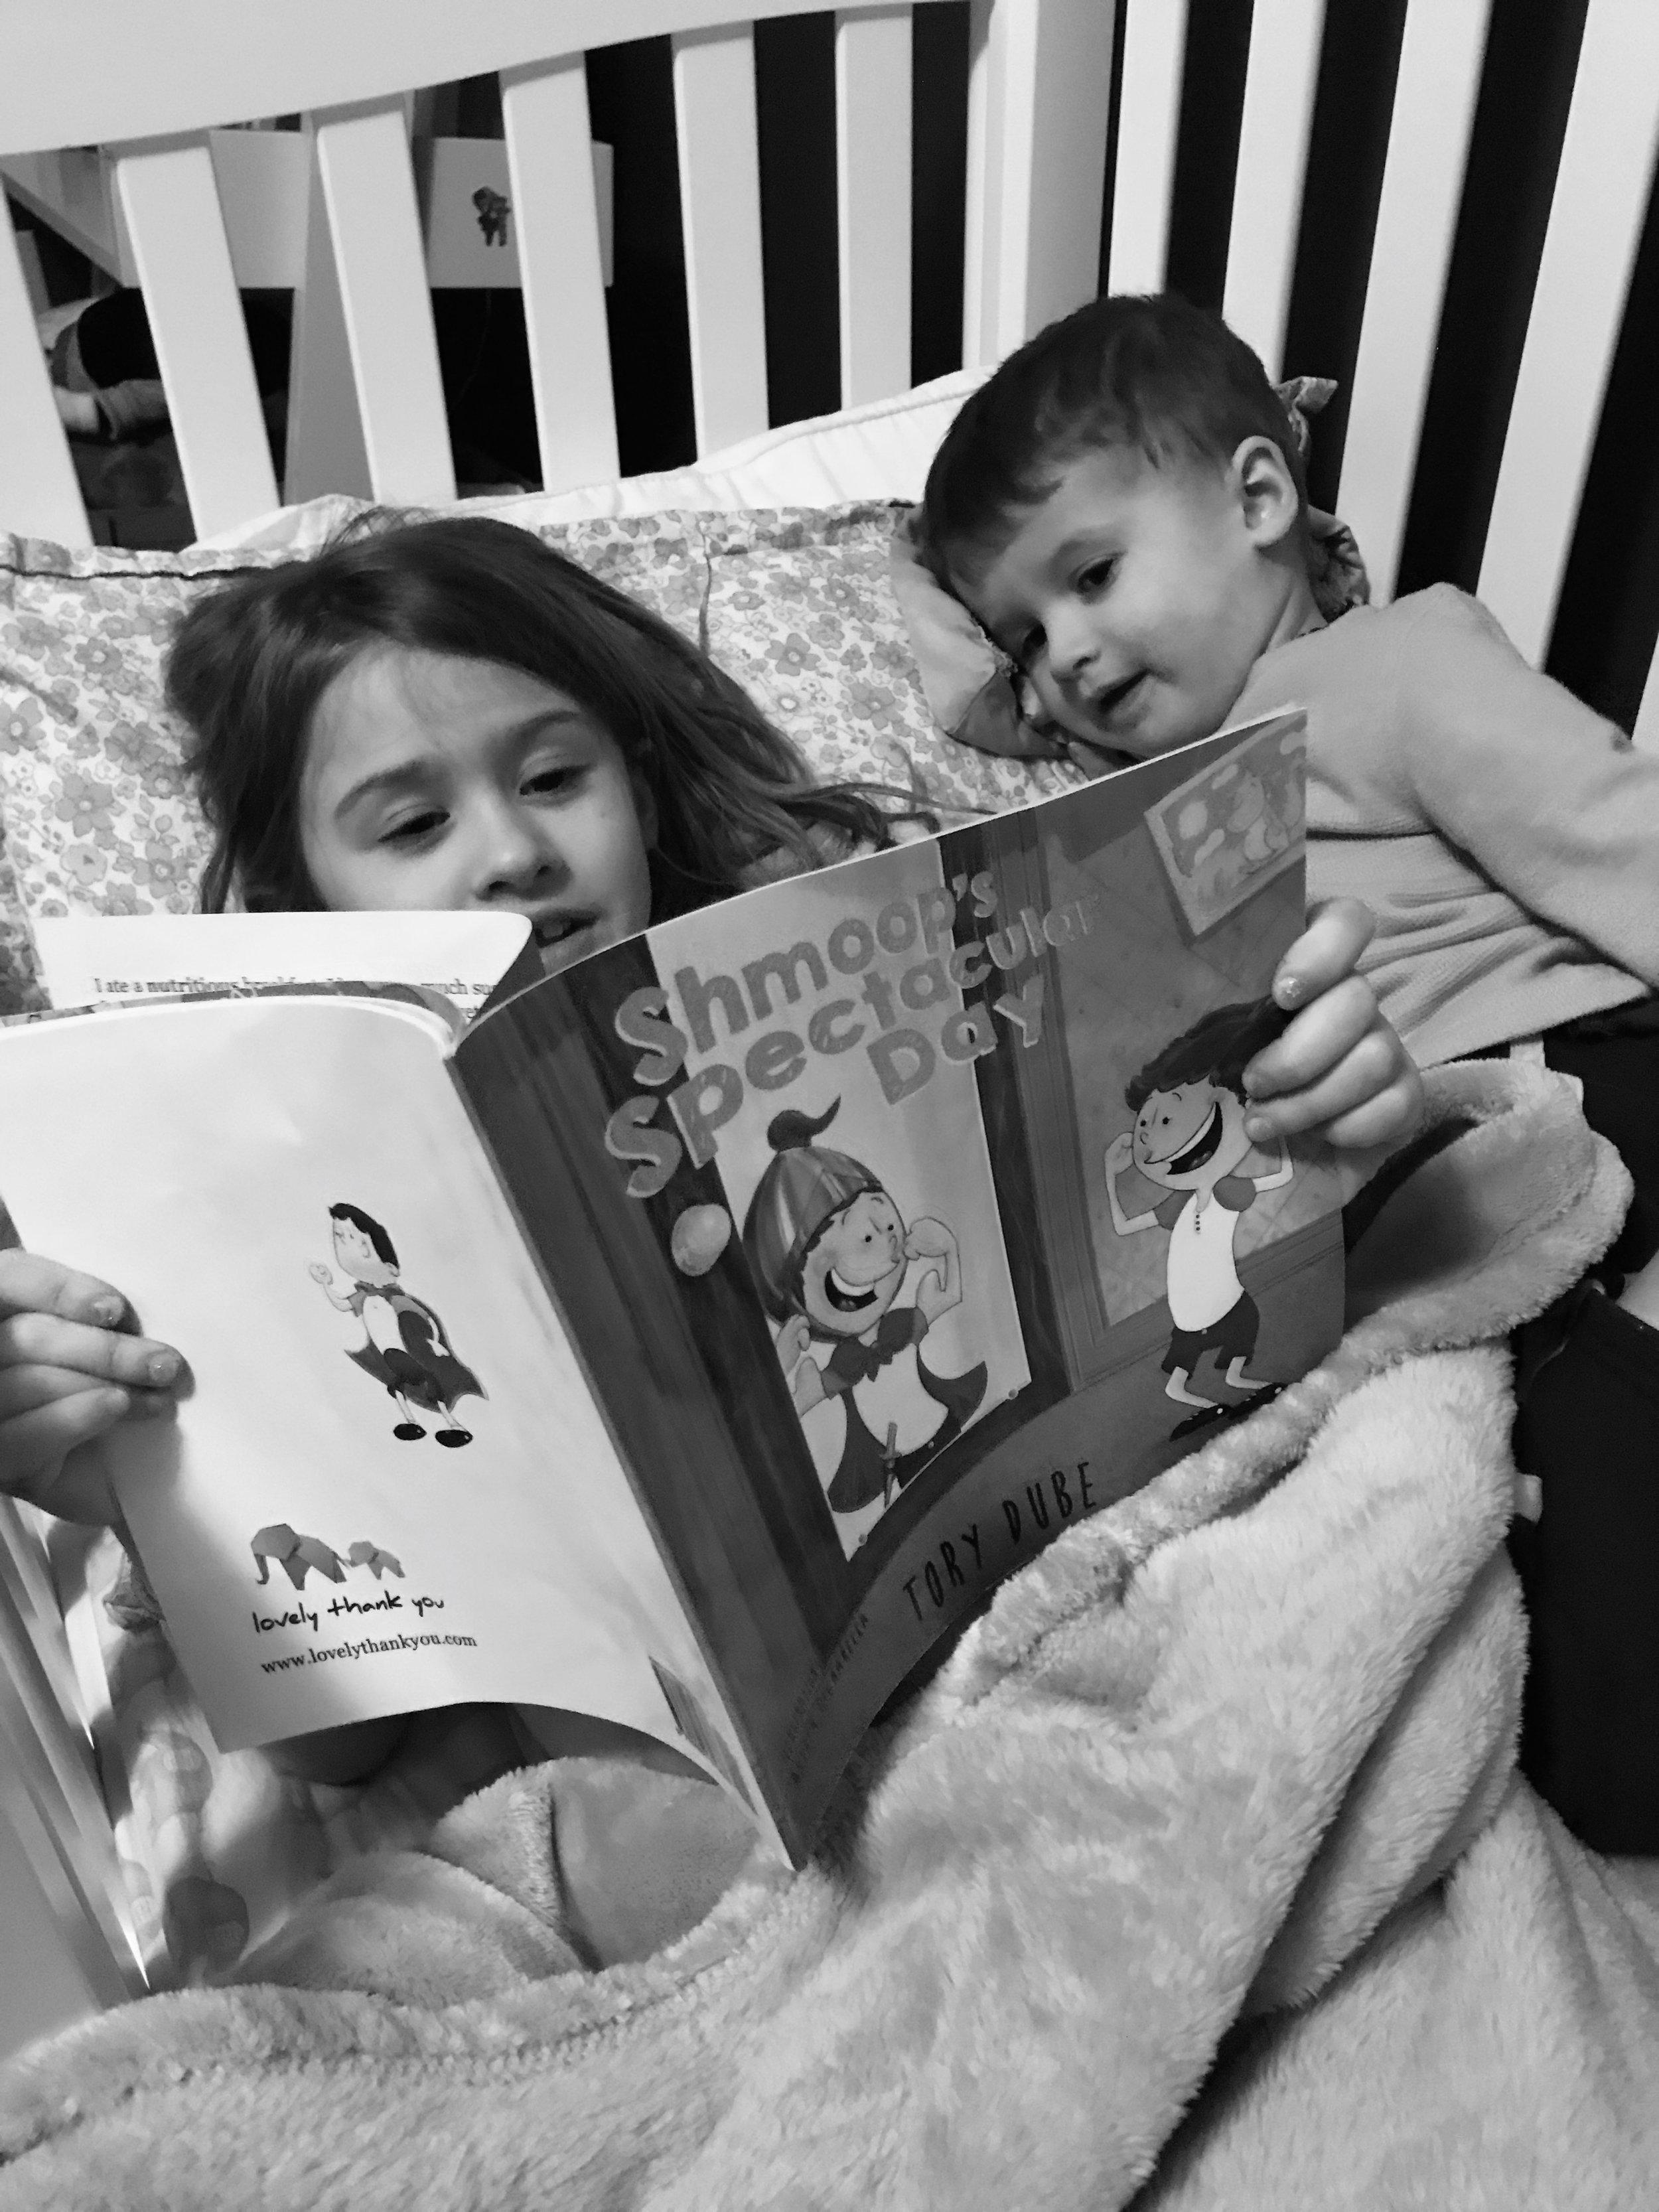 self love children's book